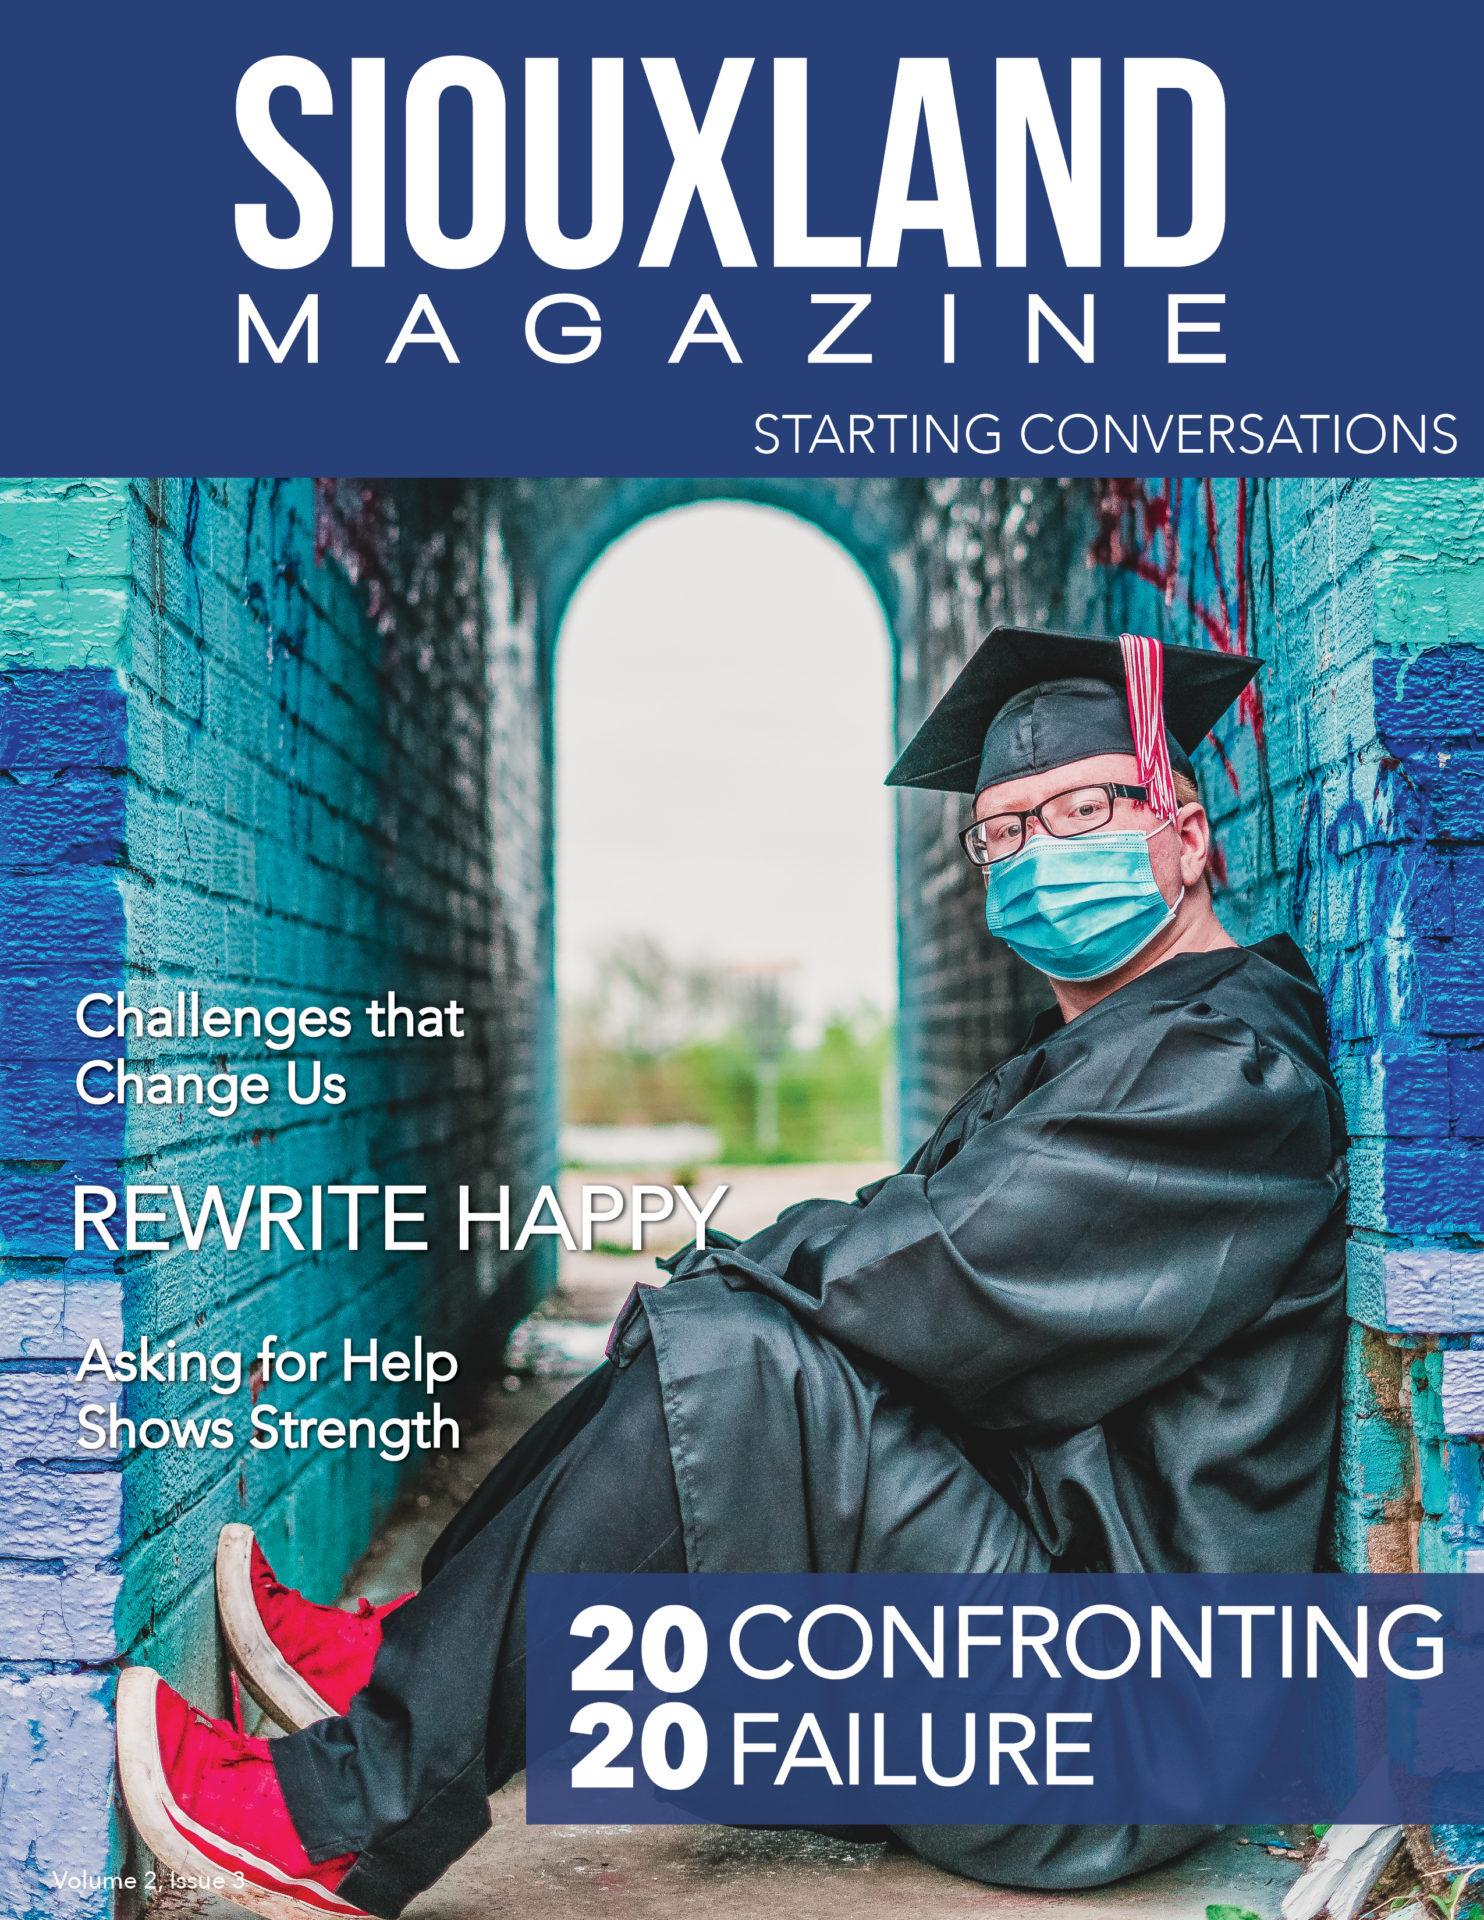 Siouxland Magazine May 2020 edition